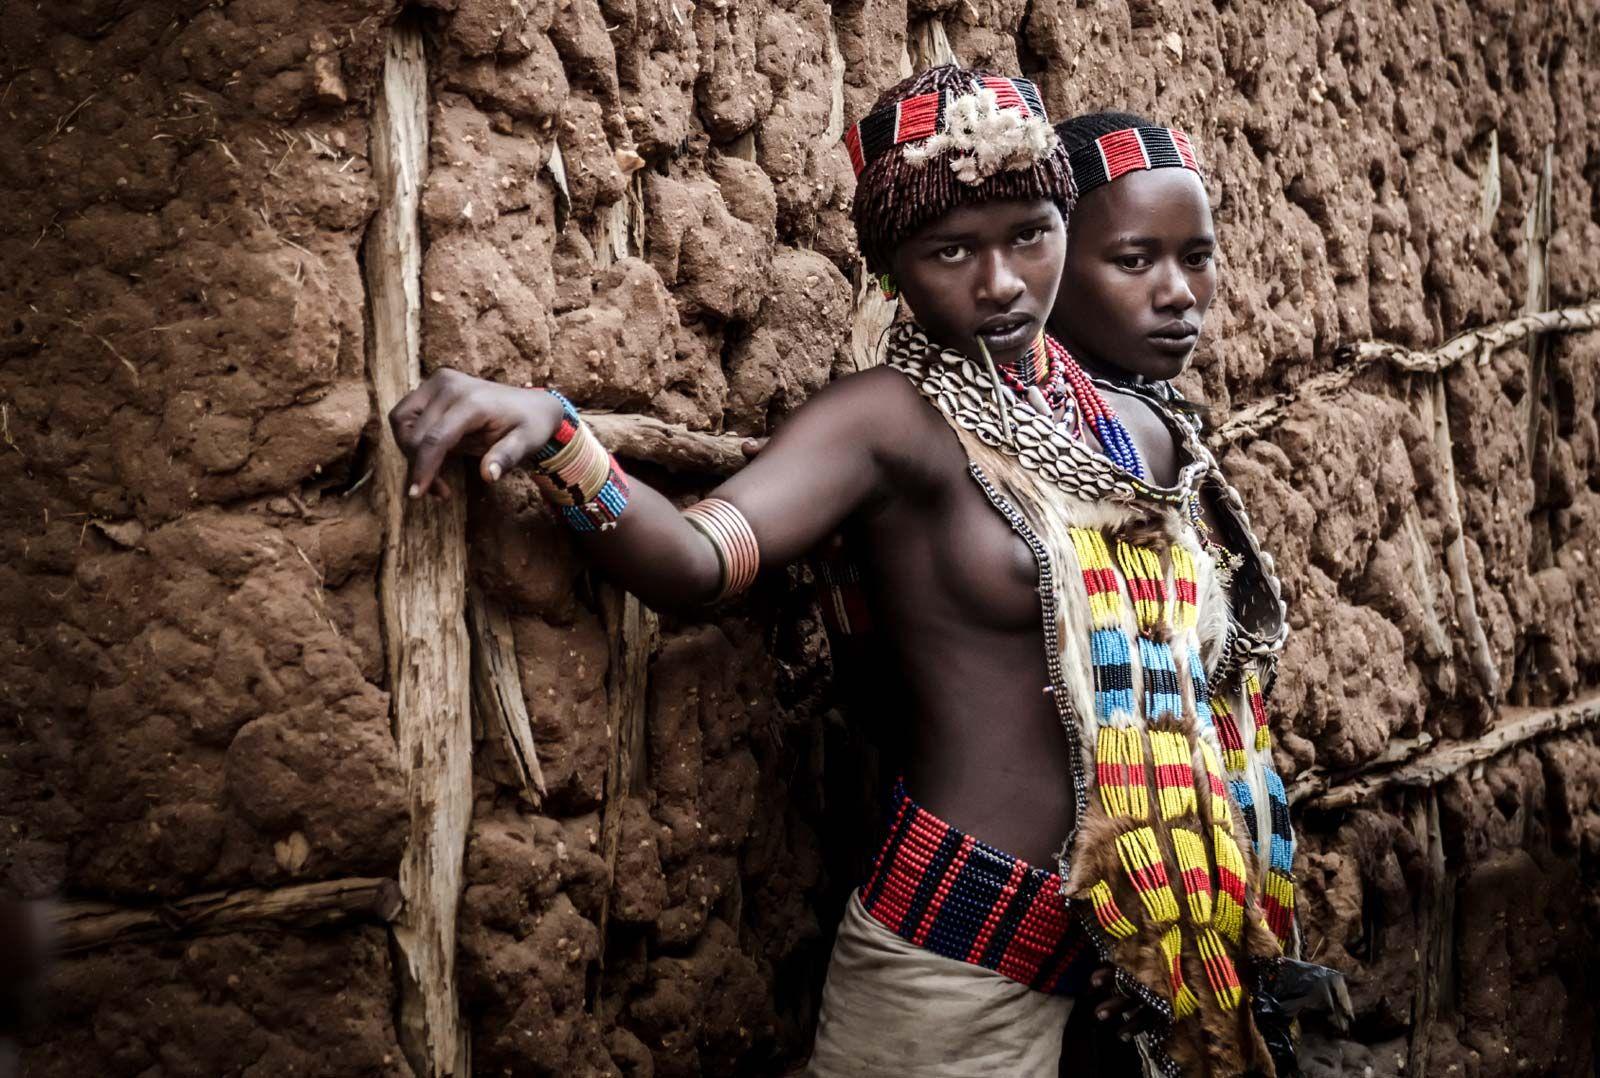 Populares Tribo Hamer, vale do Omo, Etiópia | Africa Travel | Pinterest  EJ33